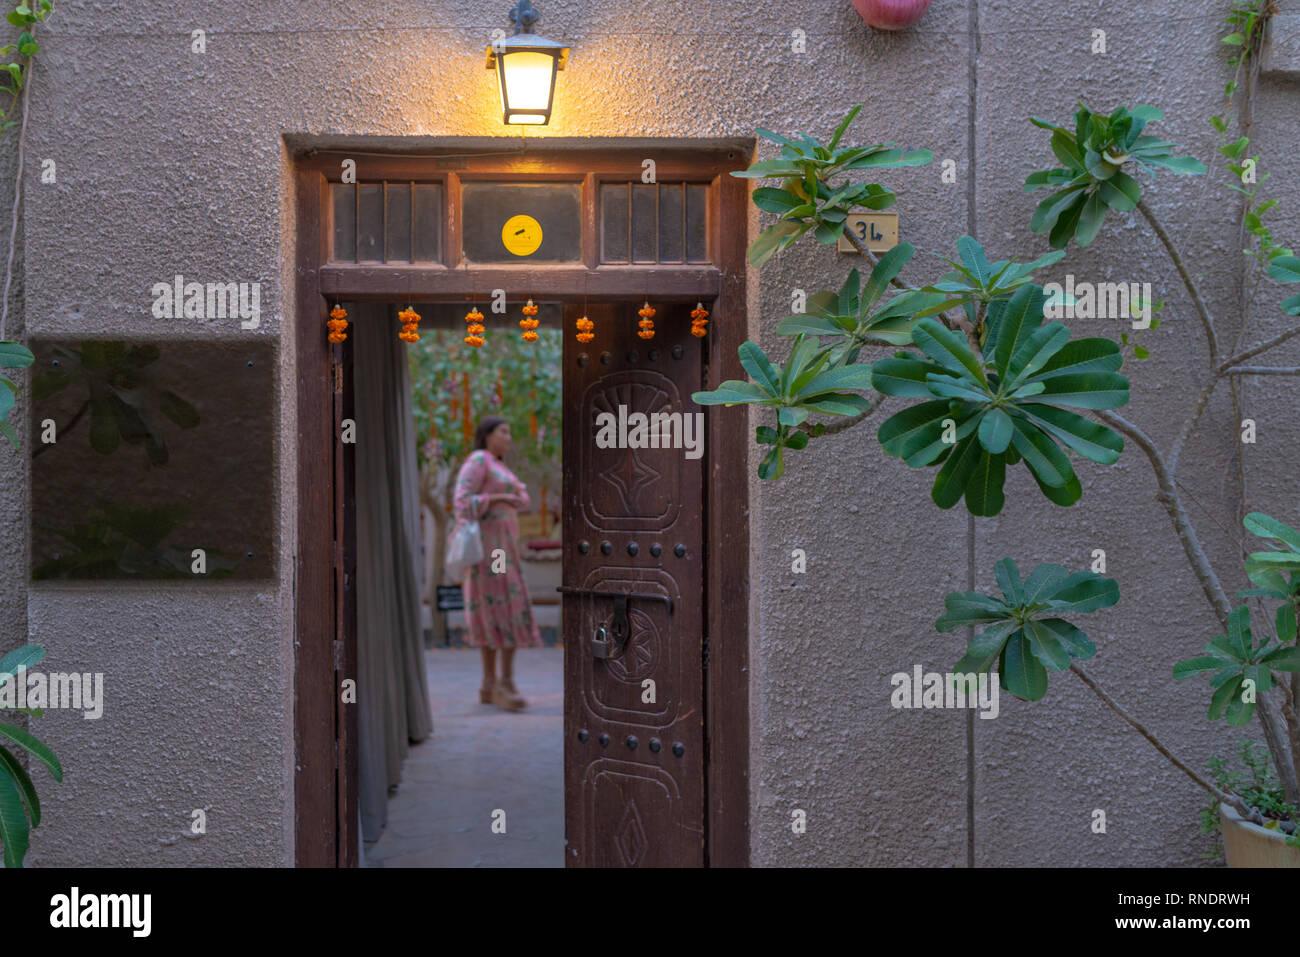 Entrance of a boutique hotel  in Al Fahidi Historical District (Bastakiya), Dubai, United Arab Emirates - Stock Image